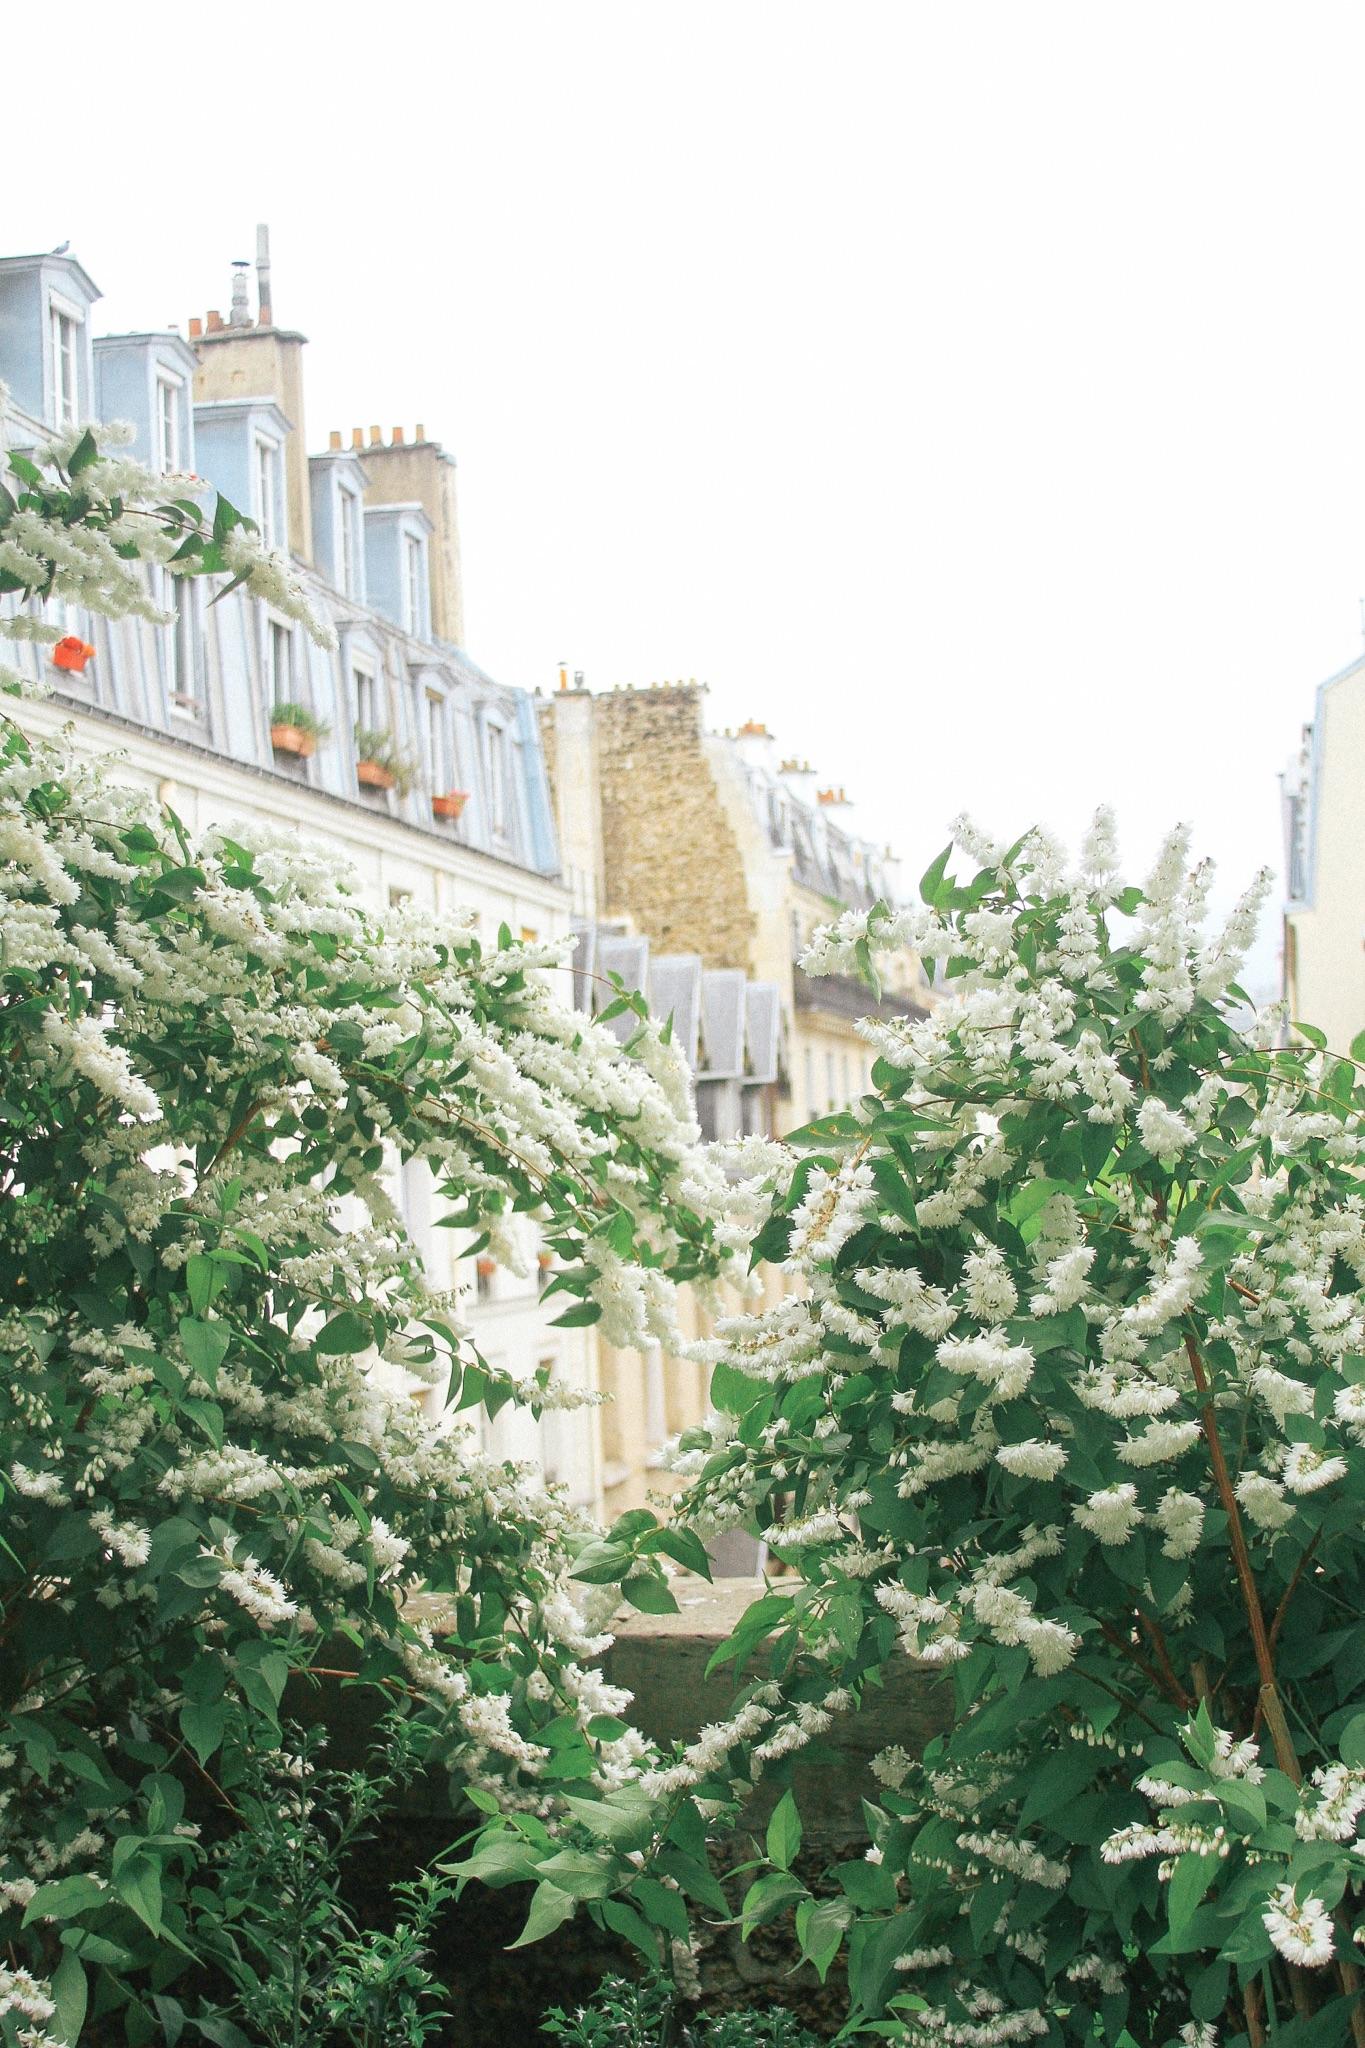 Paris-Walking-Guide-MonicaFrancis-9.jpeg